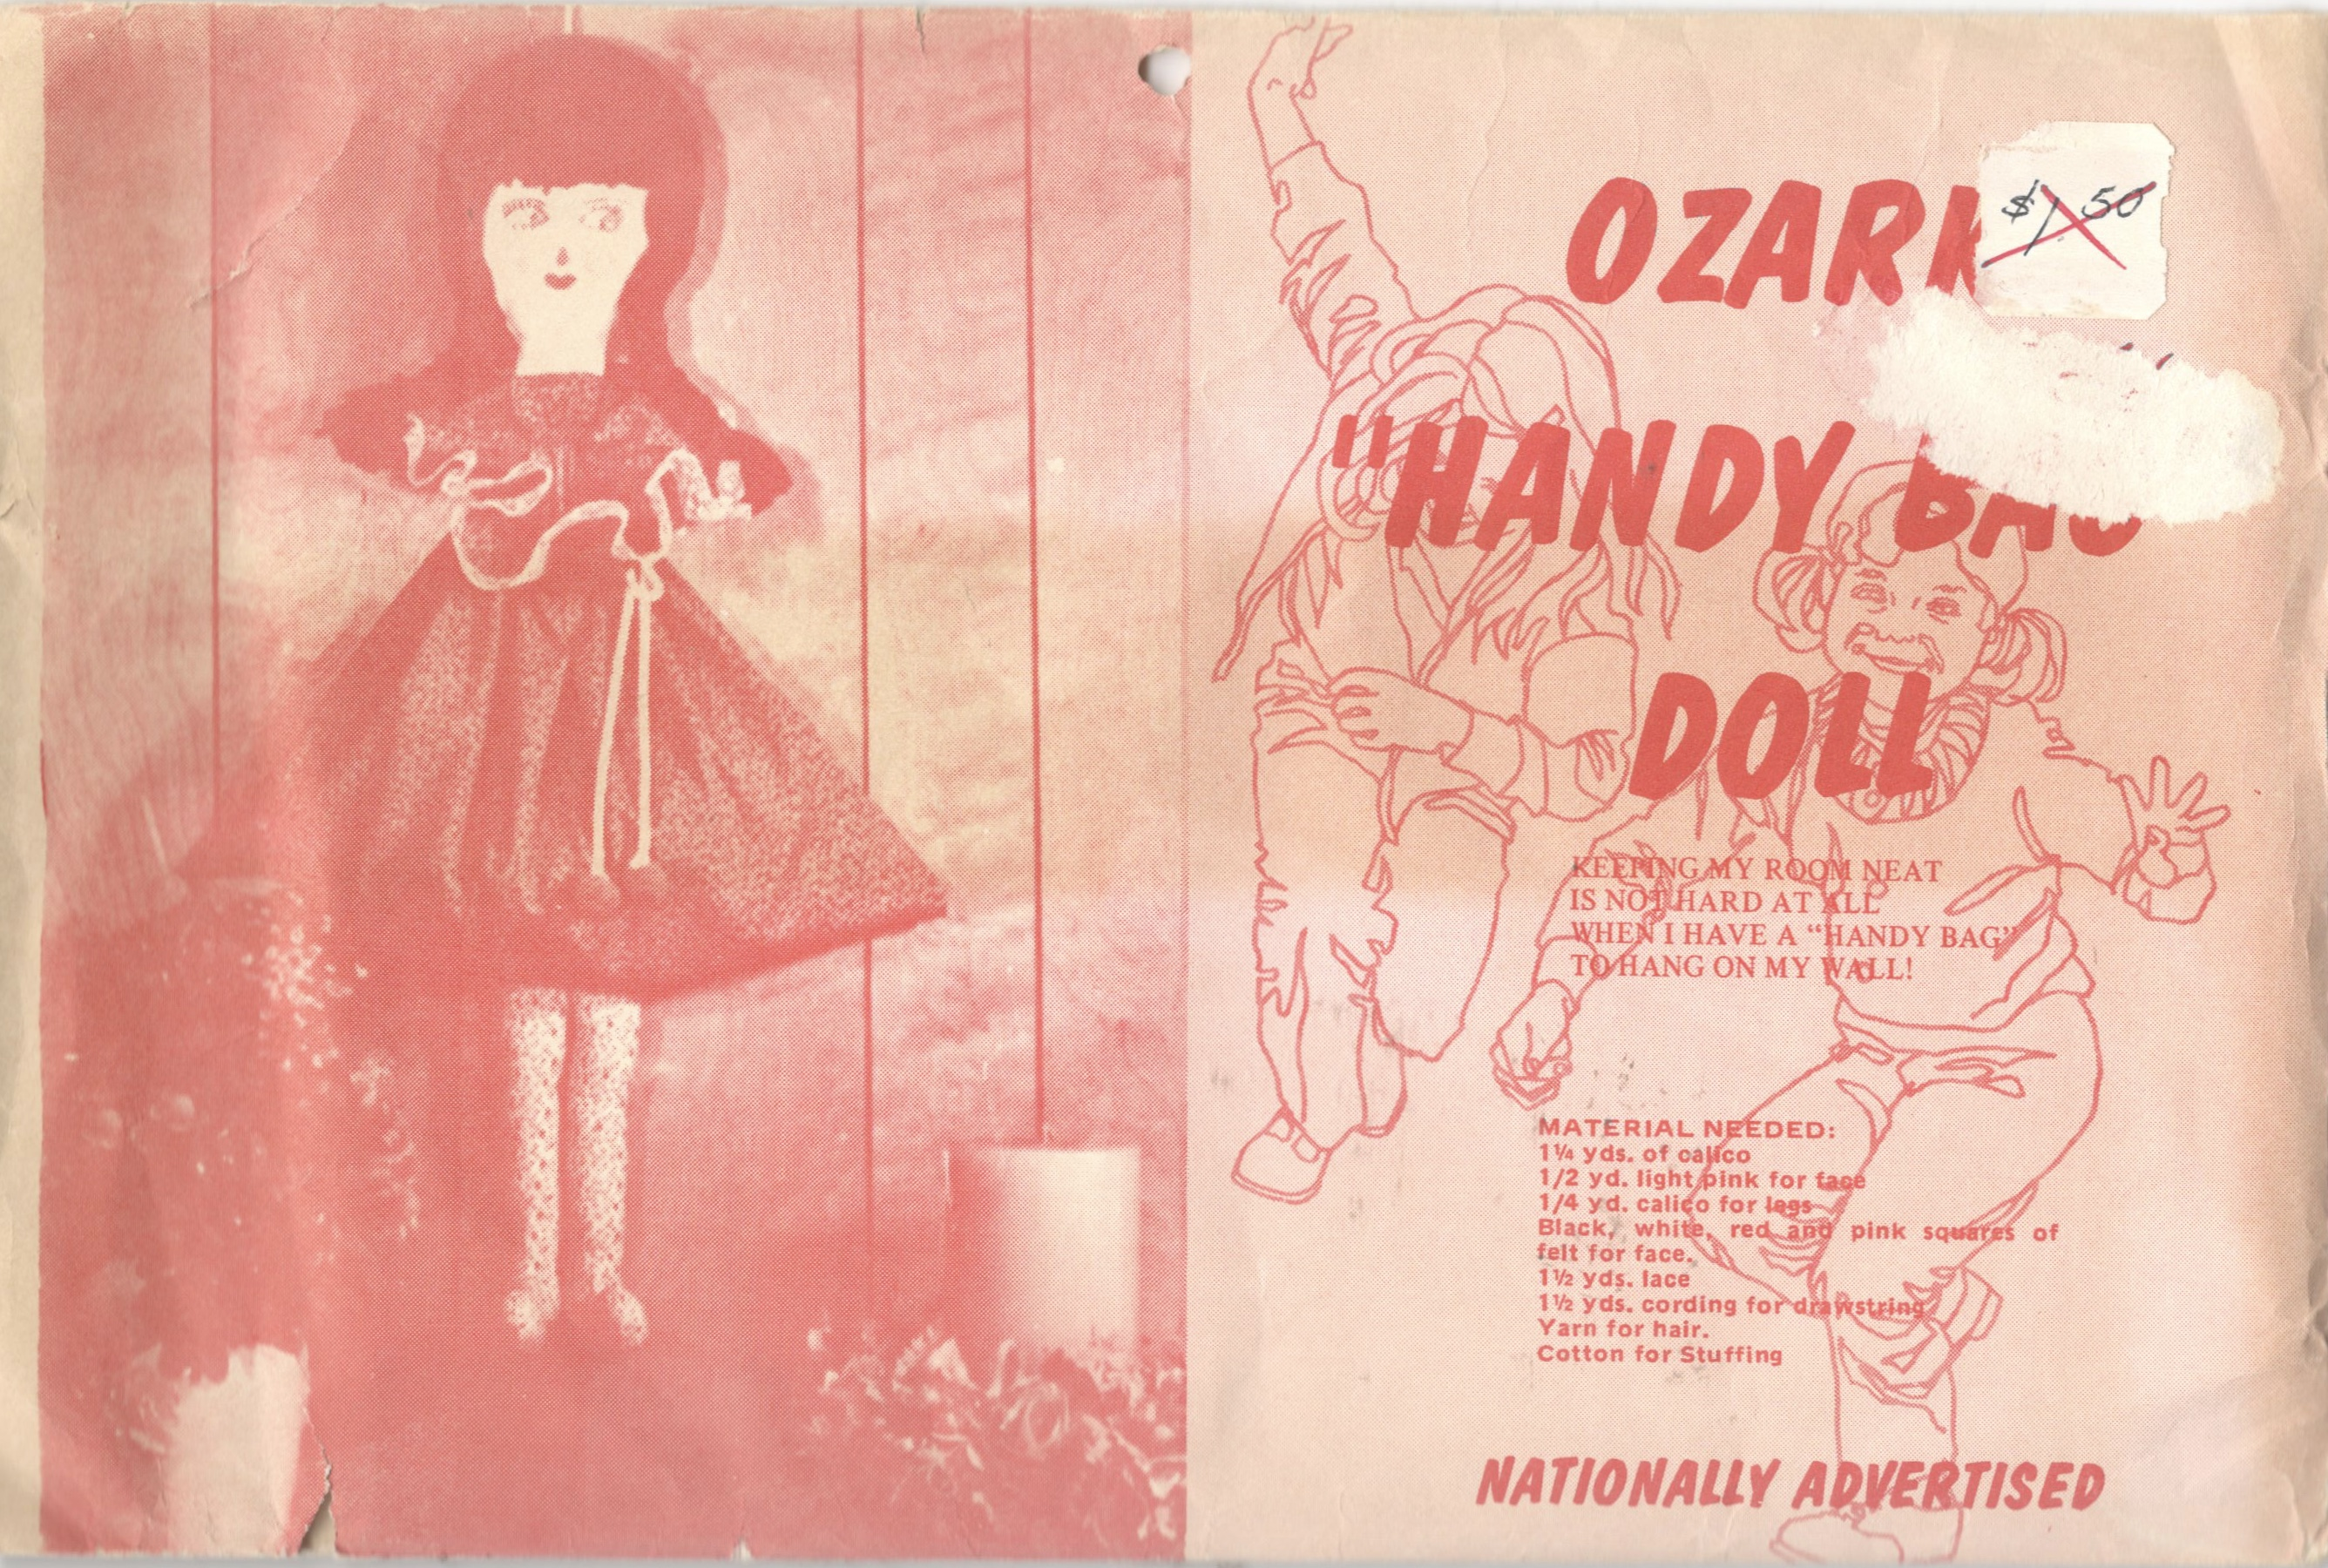 Ozark Handy Bag Doll